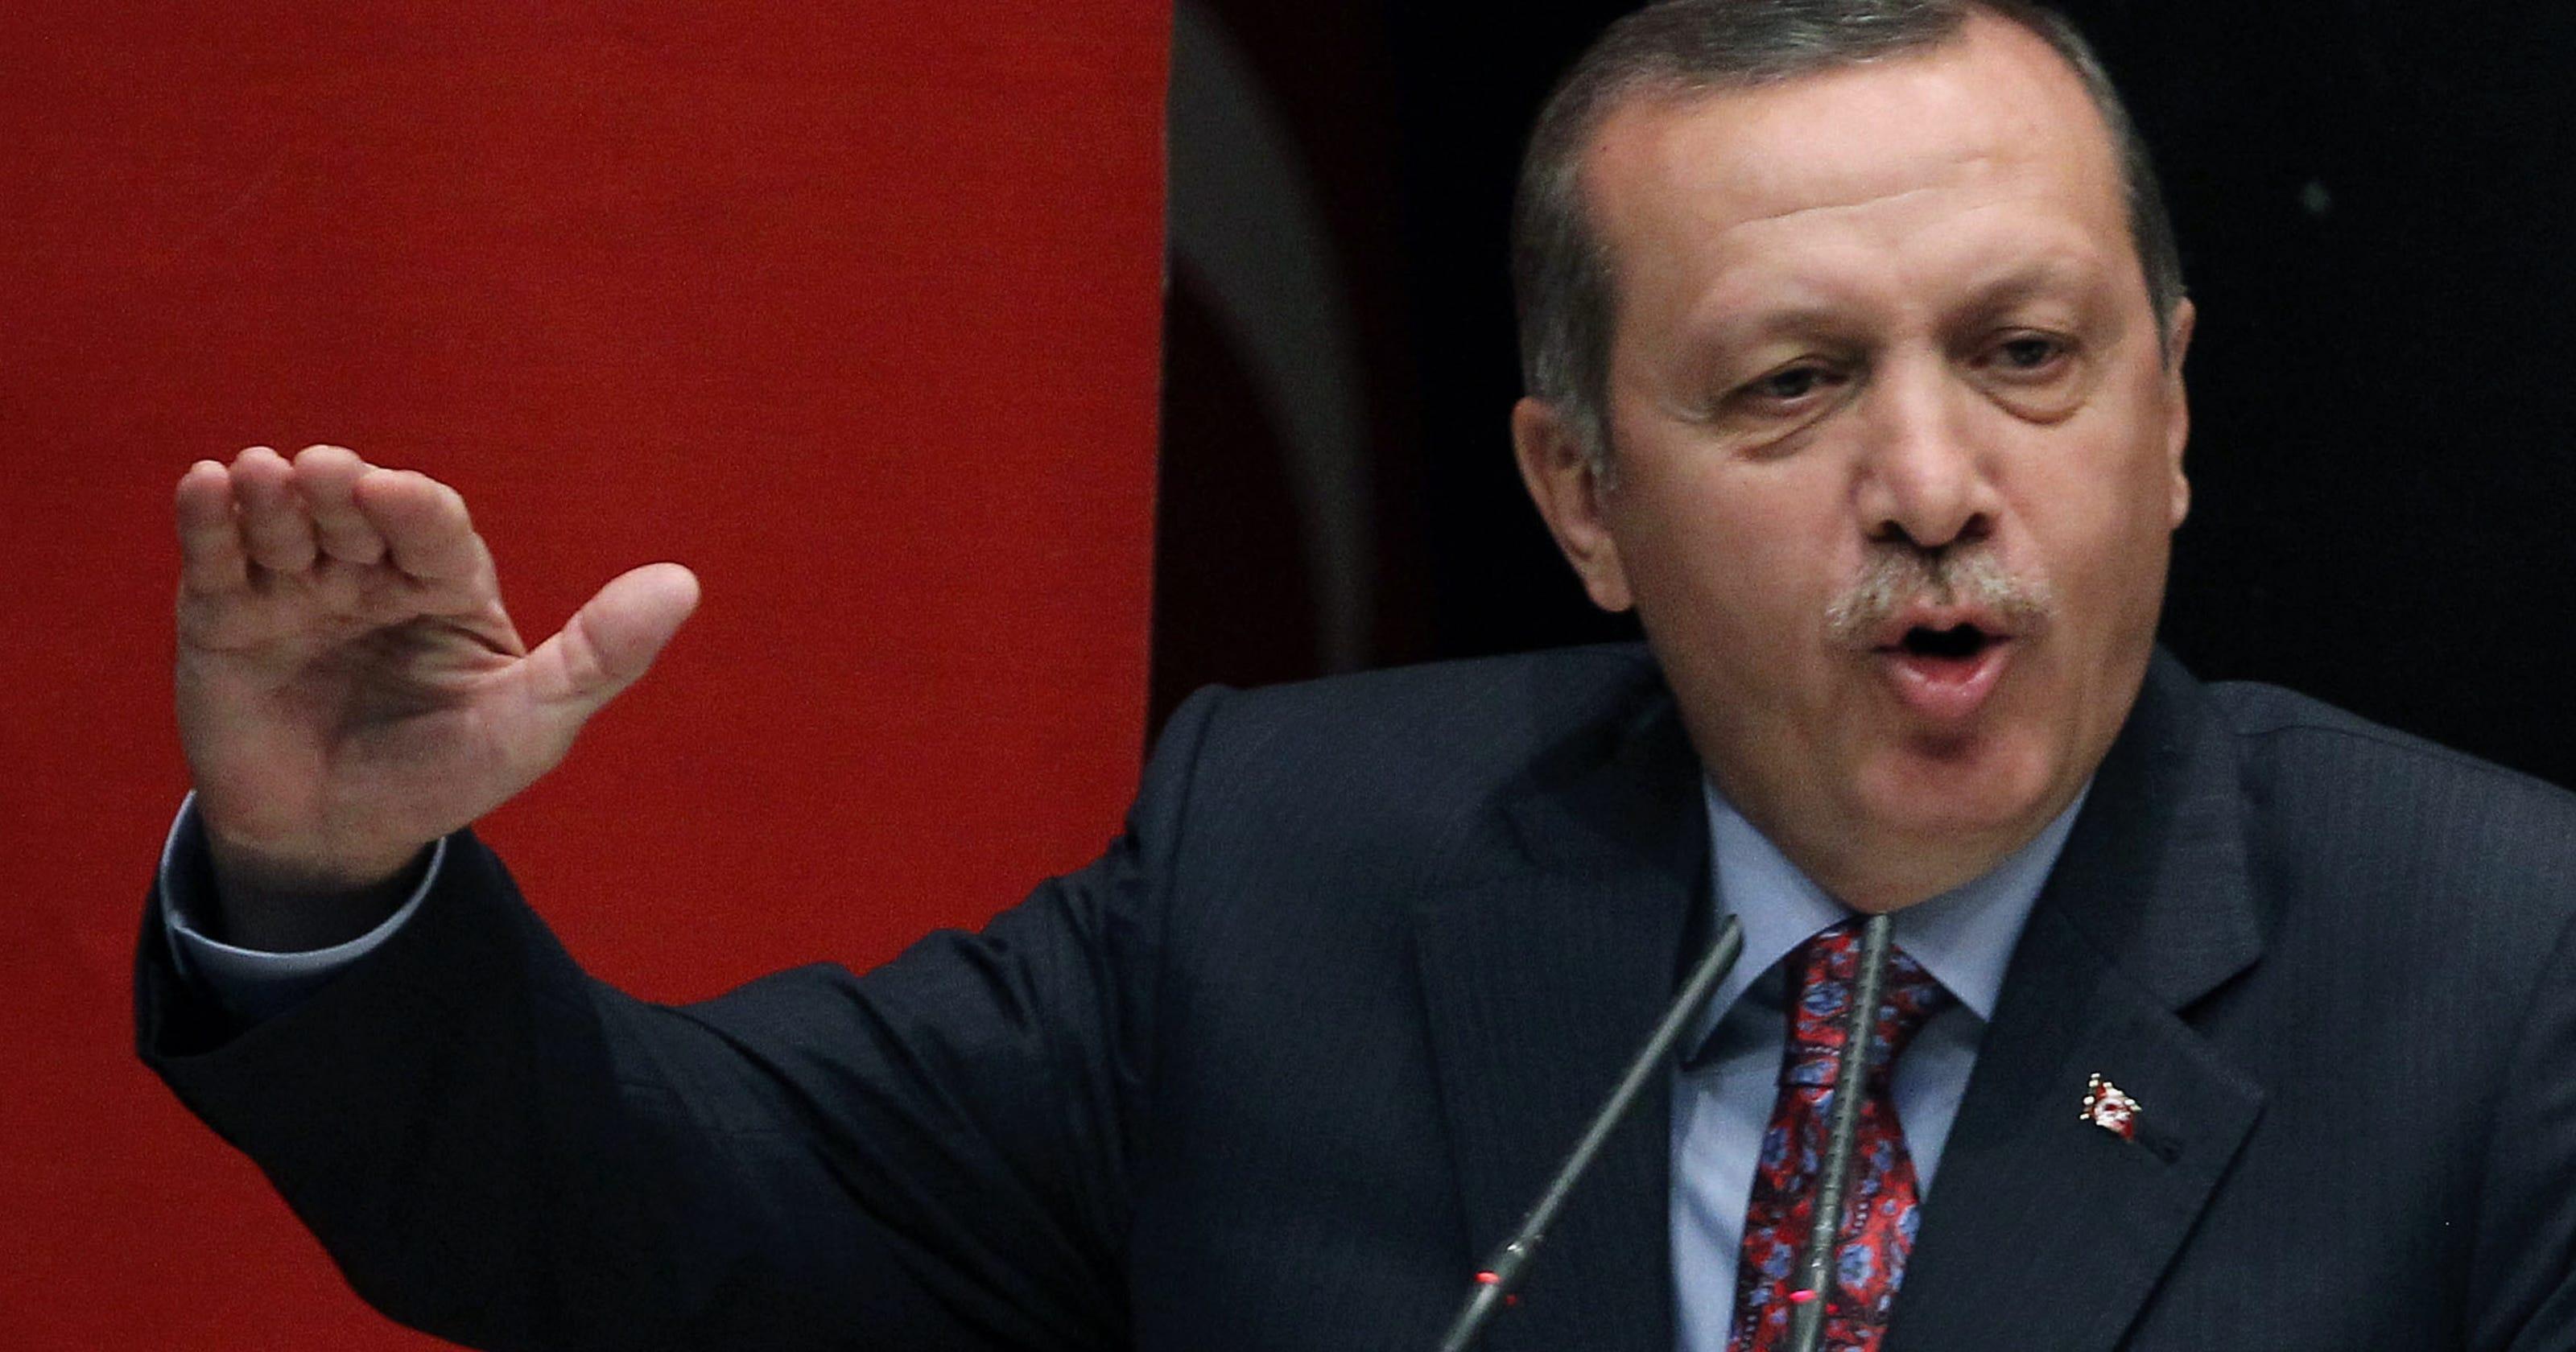 Anti Alcohol Bill Leaves Many Turks Dispirited